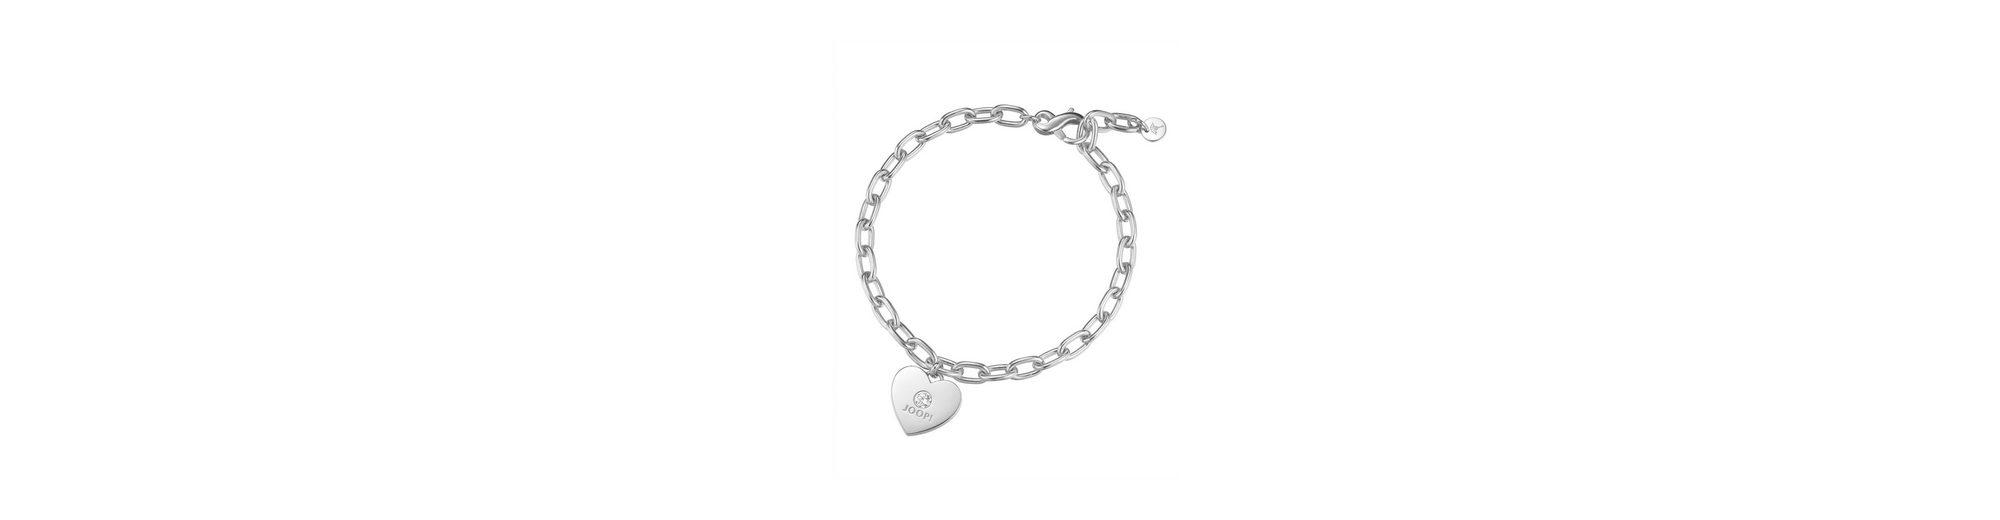 JOOP! Armband, mit Zirkonia, »JP-PALADIN, JPBR90373A215«